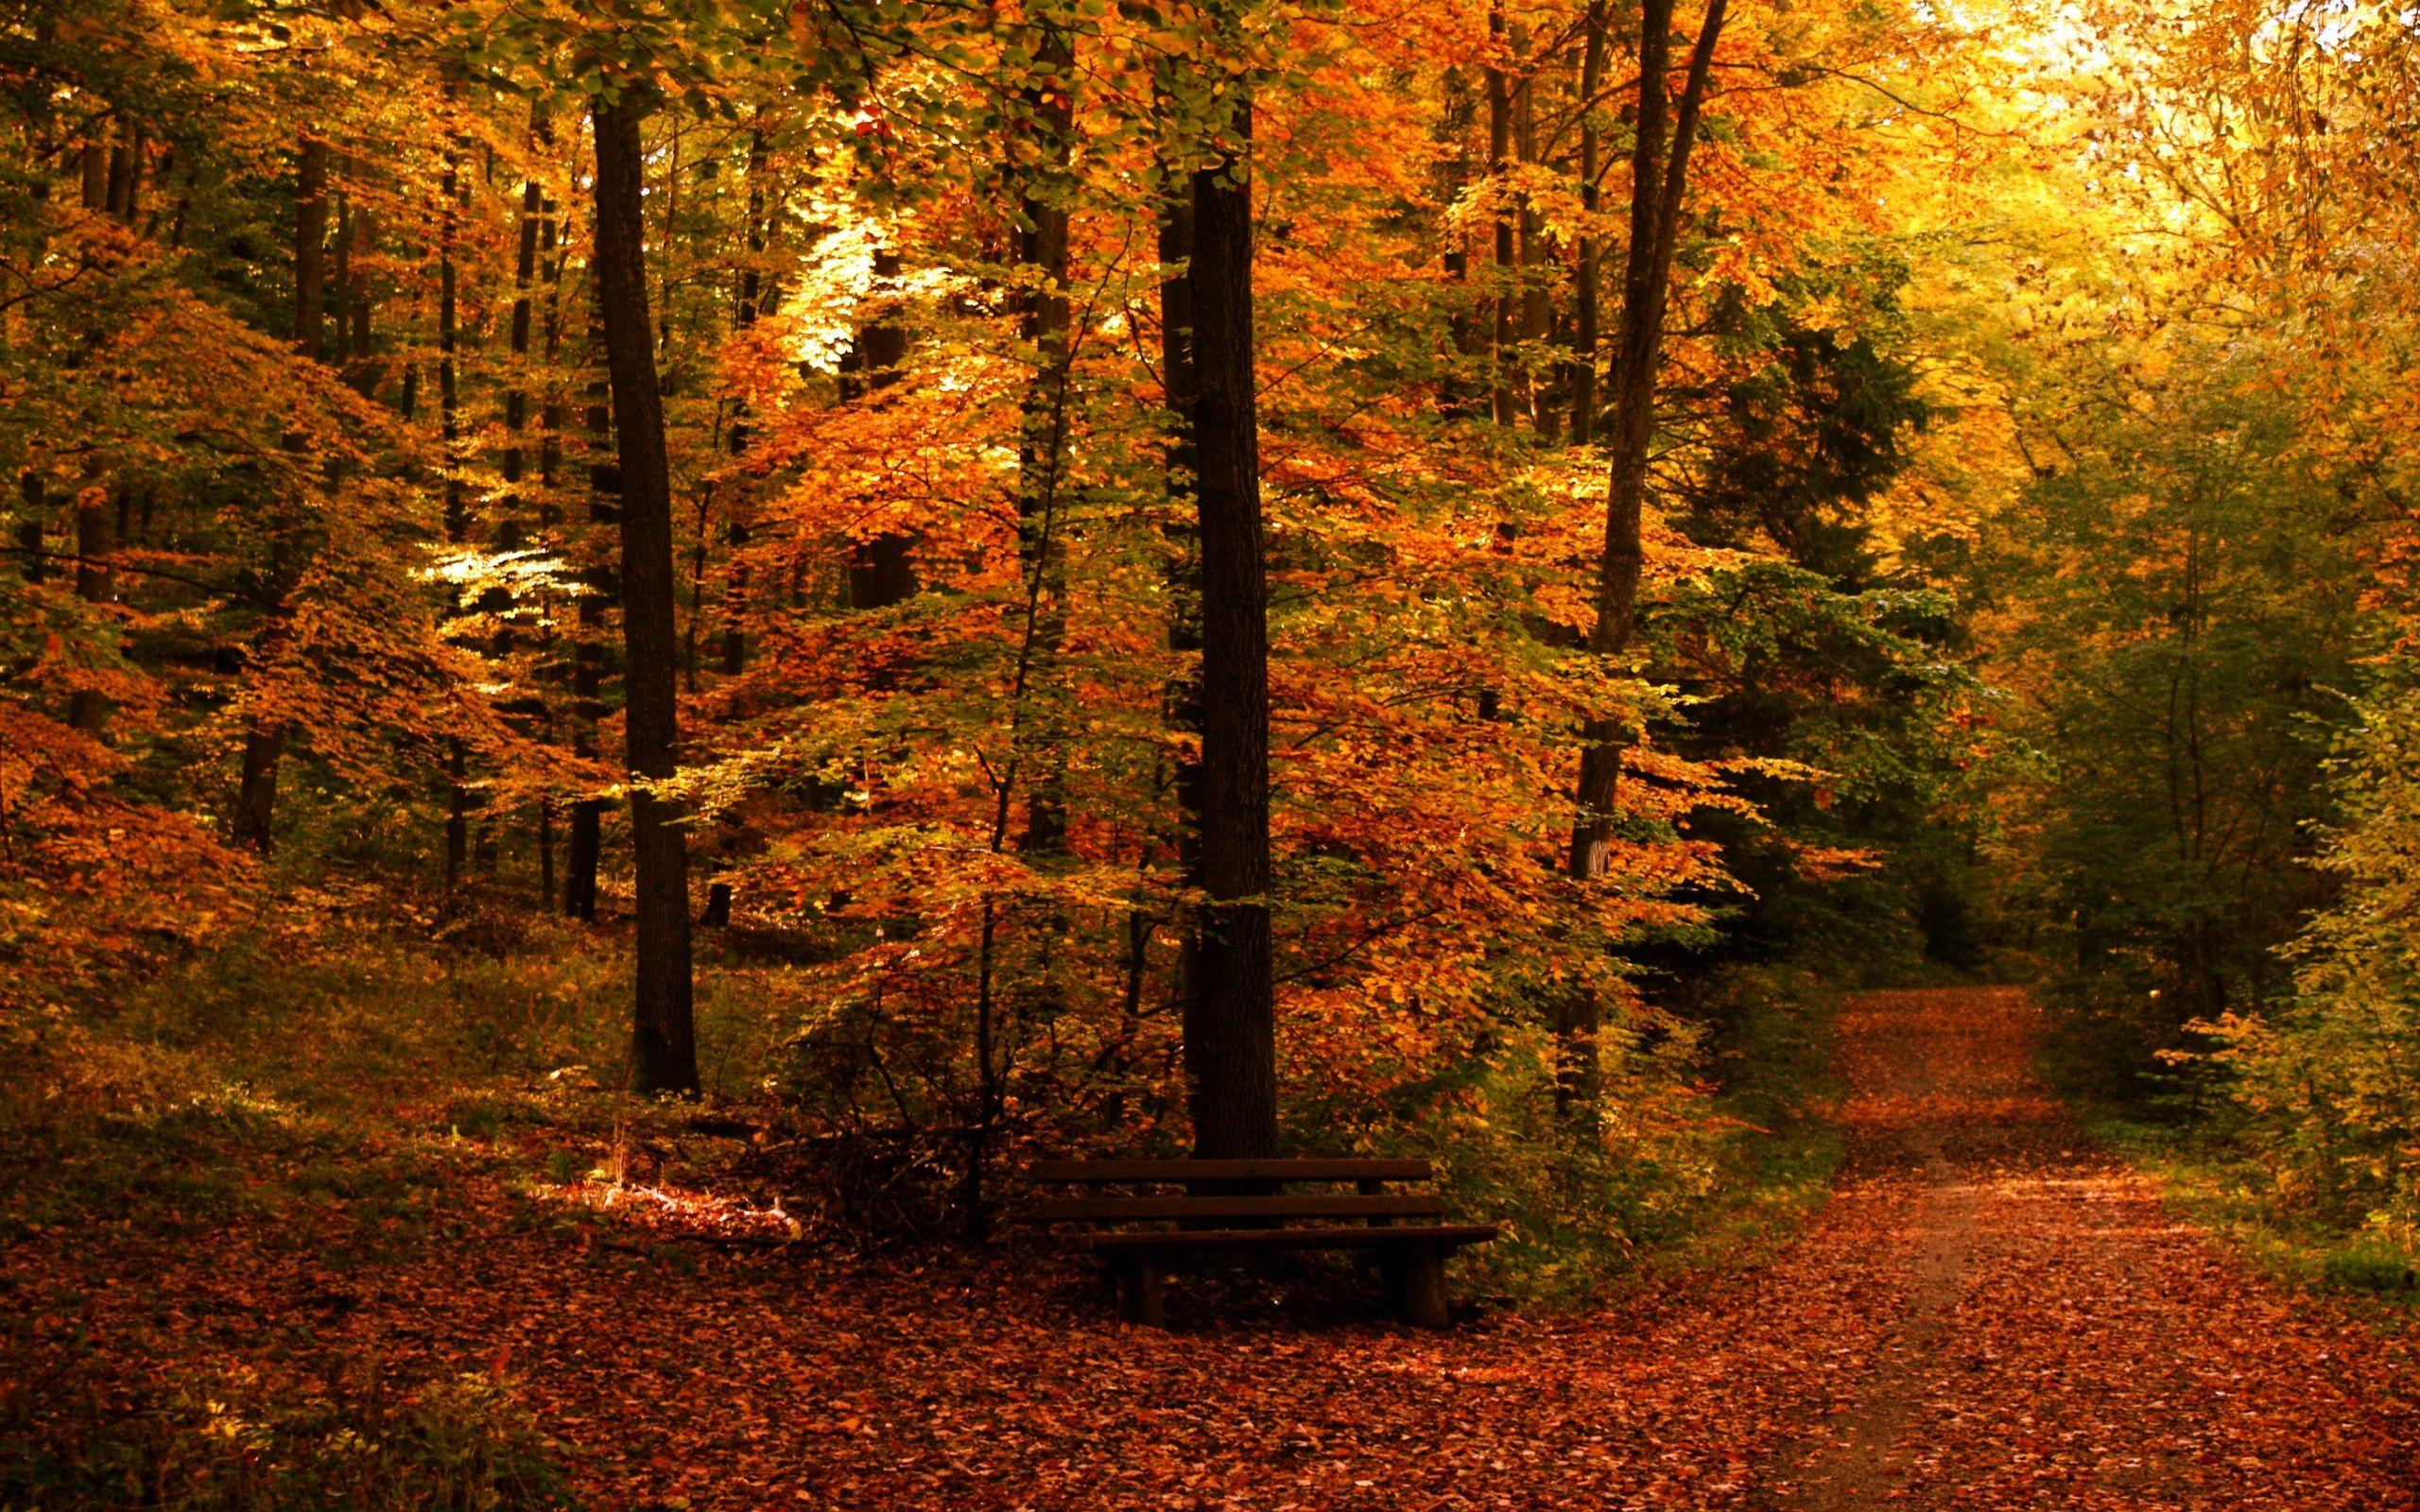 Google Autumn Wallpaper For Desktop Desktop Backgrounds Desktop Wallpaper Autumn Fall Backgrounds Fall Autumn Landscape Landscape Wallpaper Fall Pictures